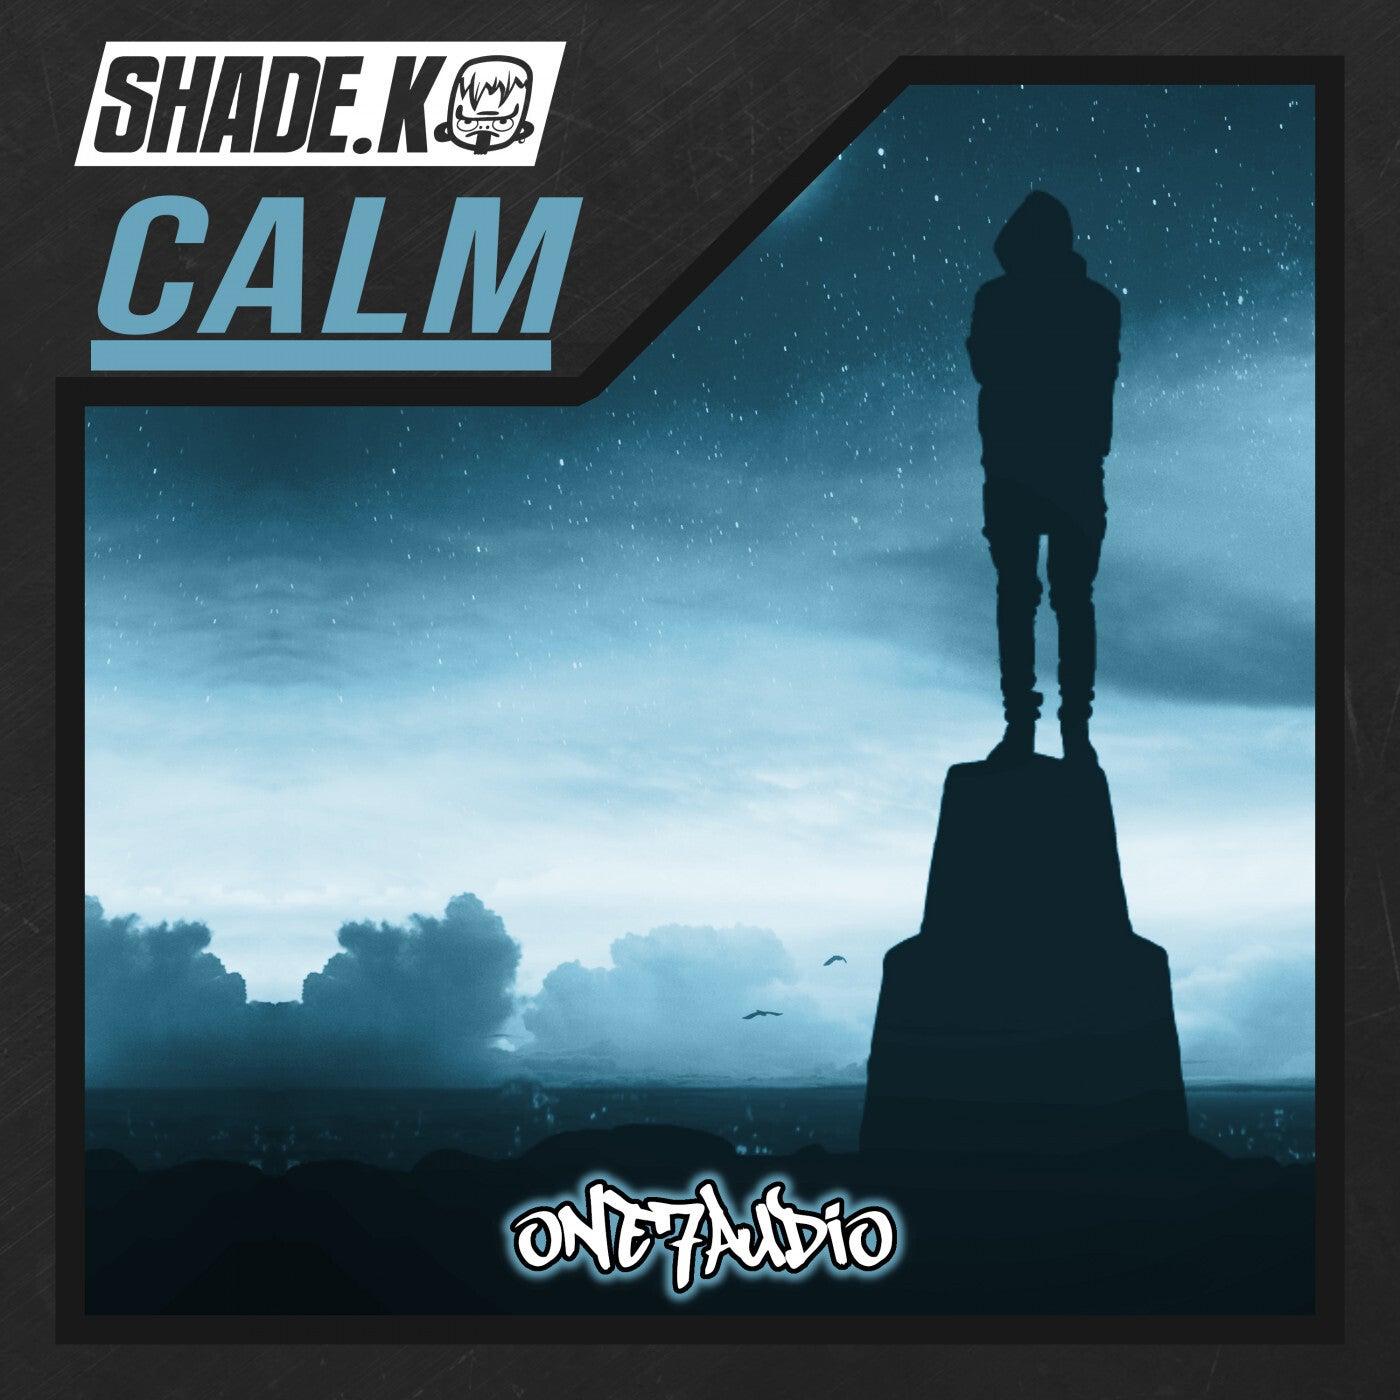 Calm (Con Calma Dub Edit)